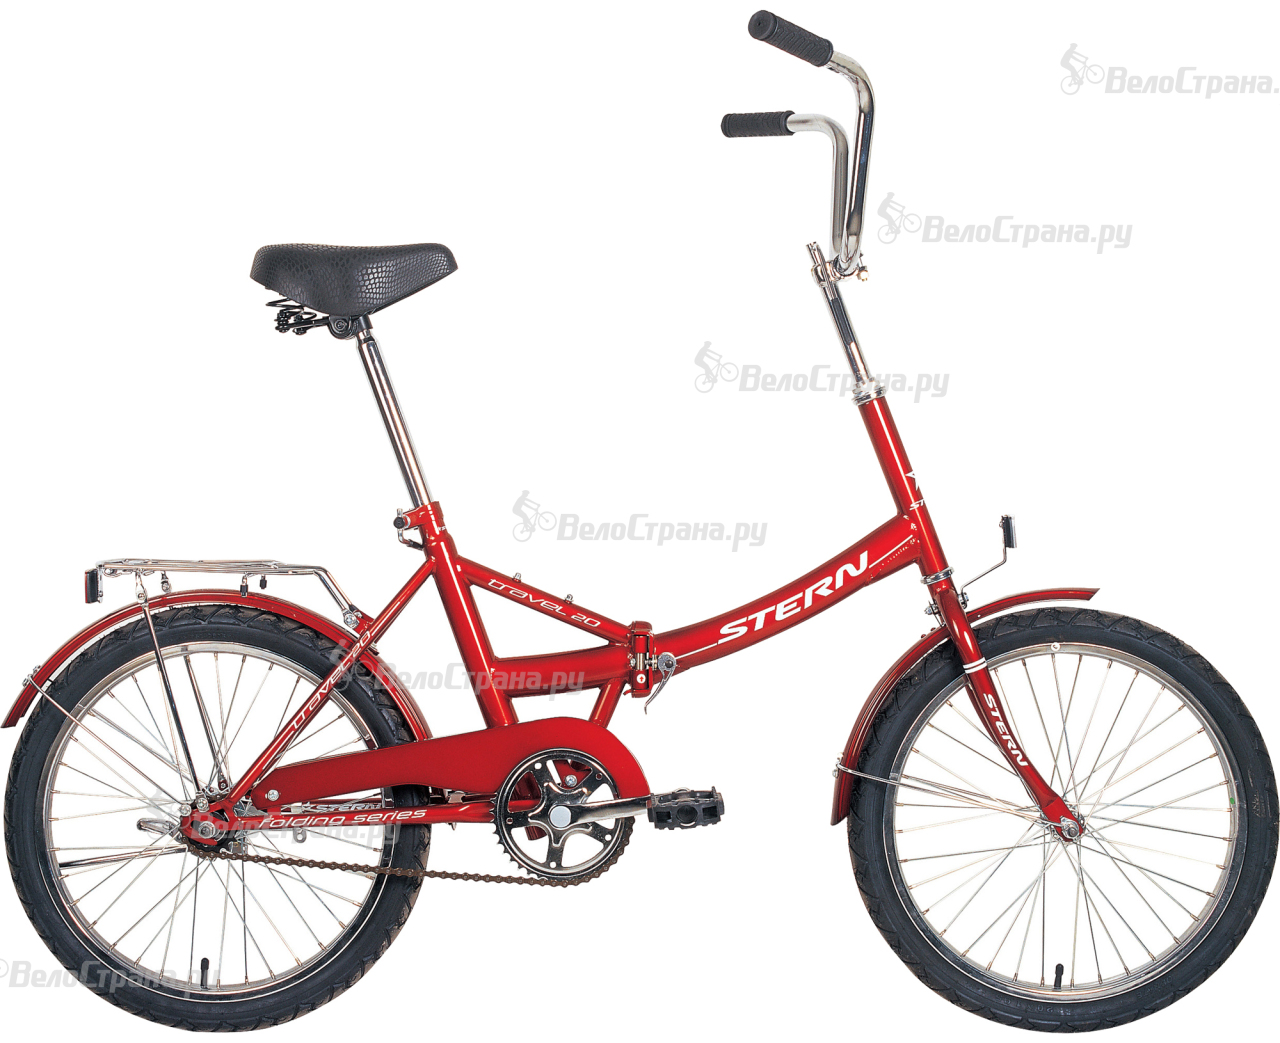 Велосипед Stern Travel 20 (2017) stern велосипед складной stern compact 2 0 20